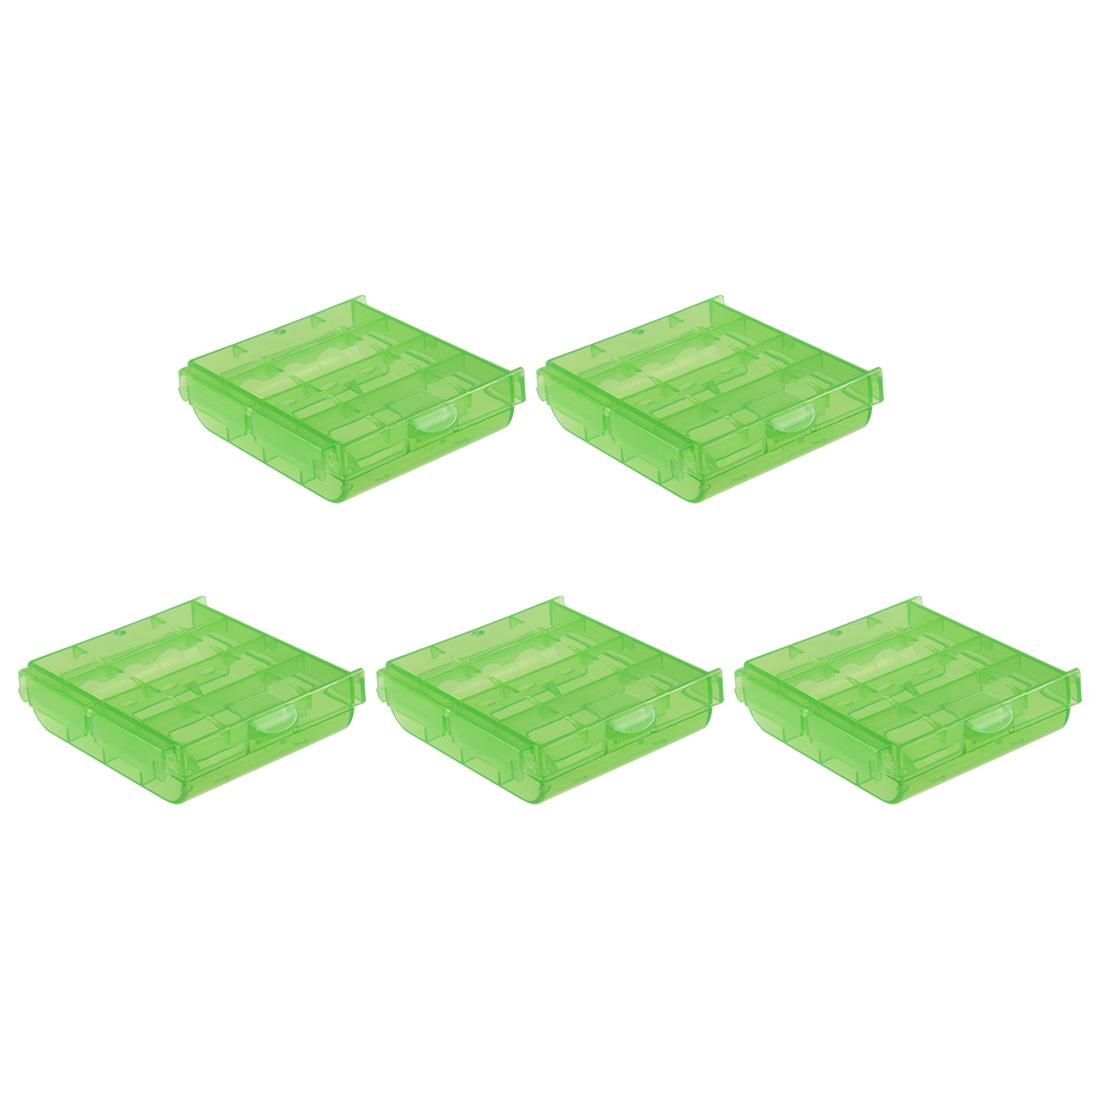 5 Pcs Battery Storage Case Holder Green 4AA or 4AAA Battery Capacity